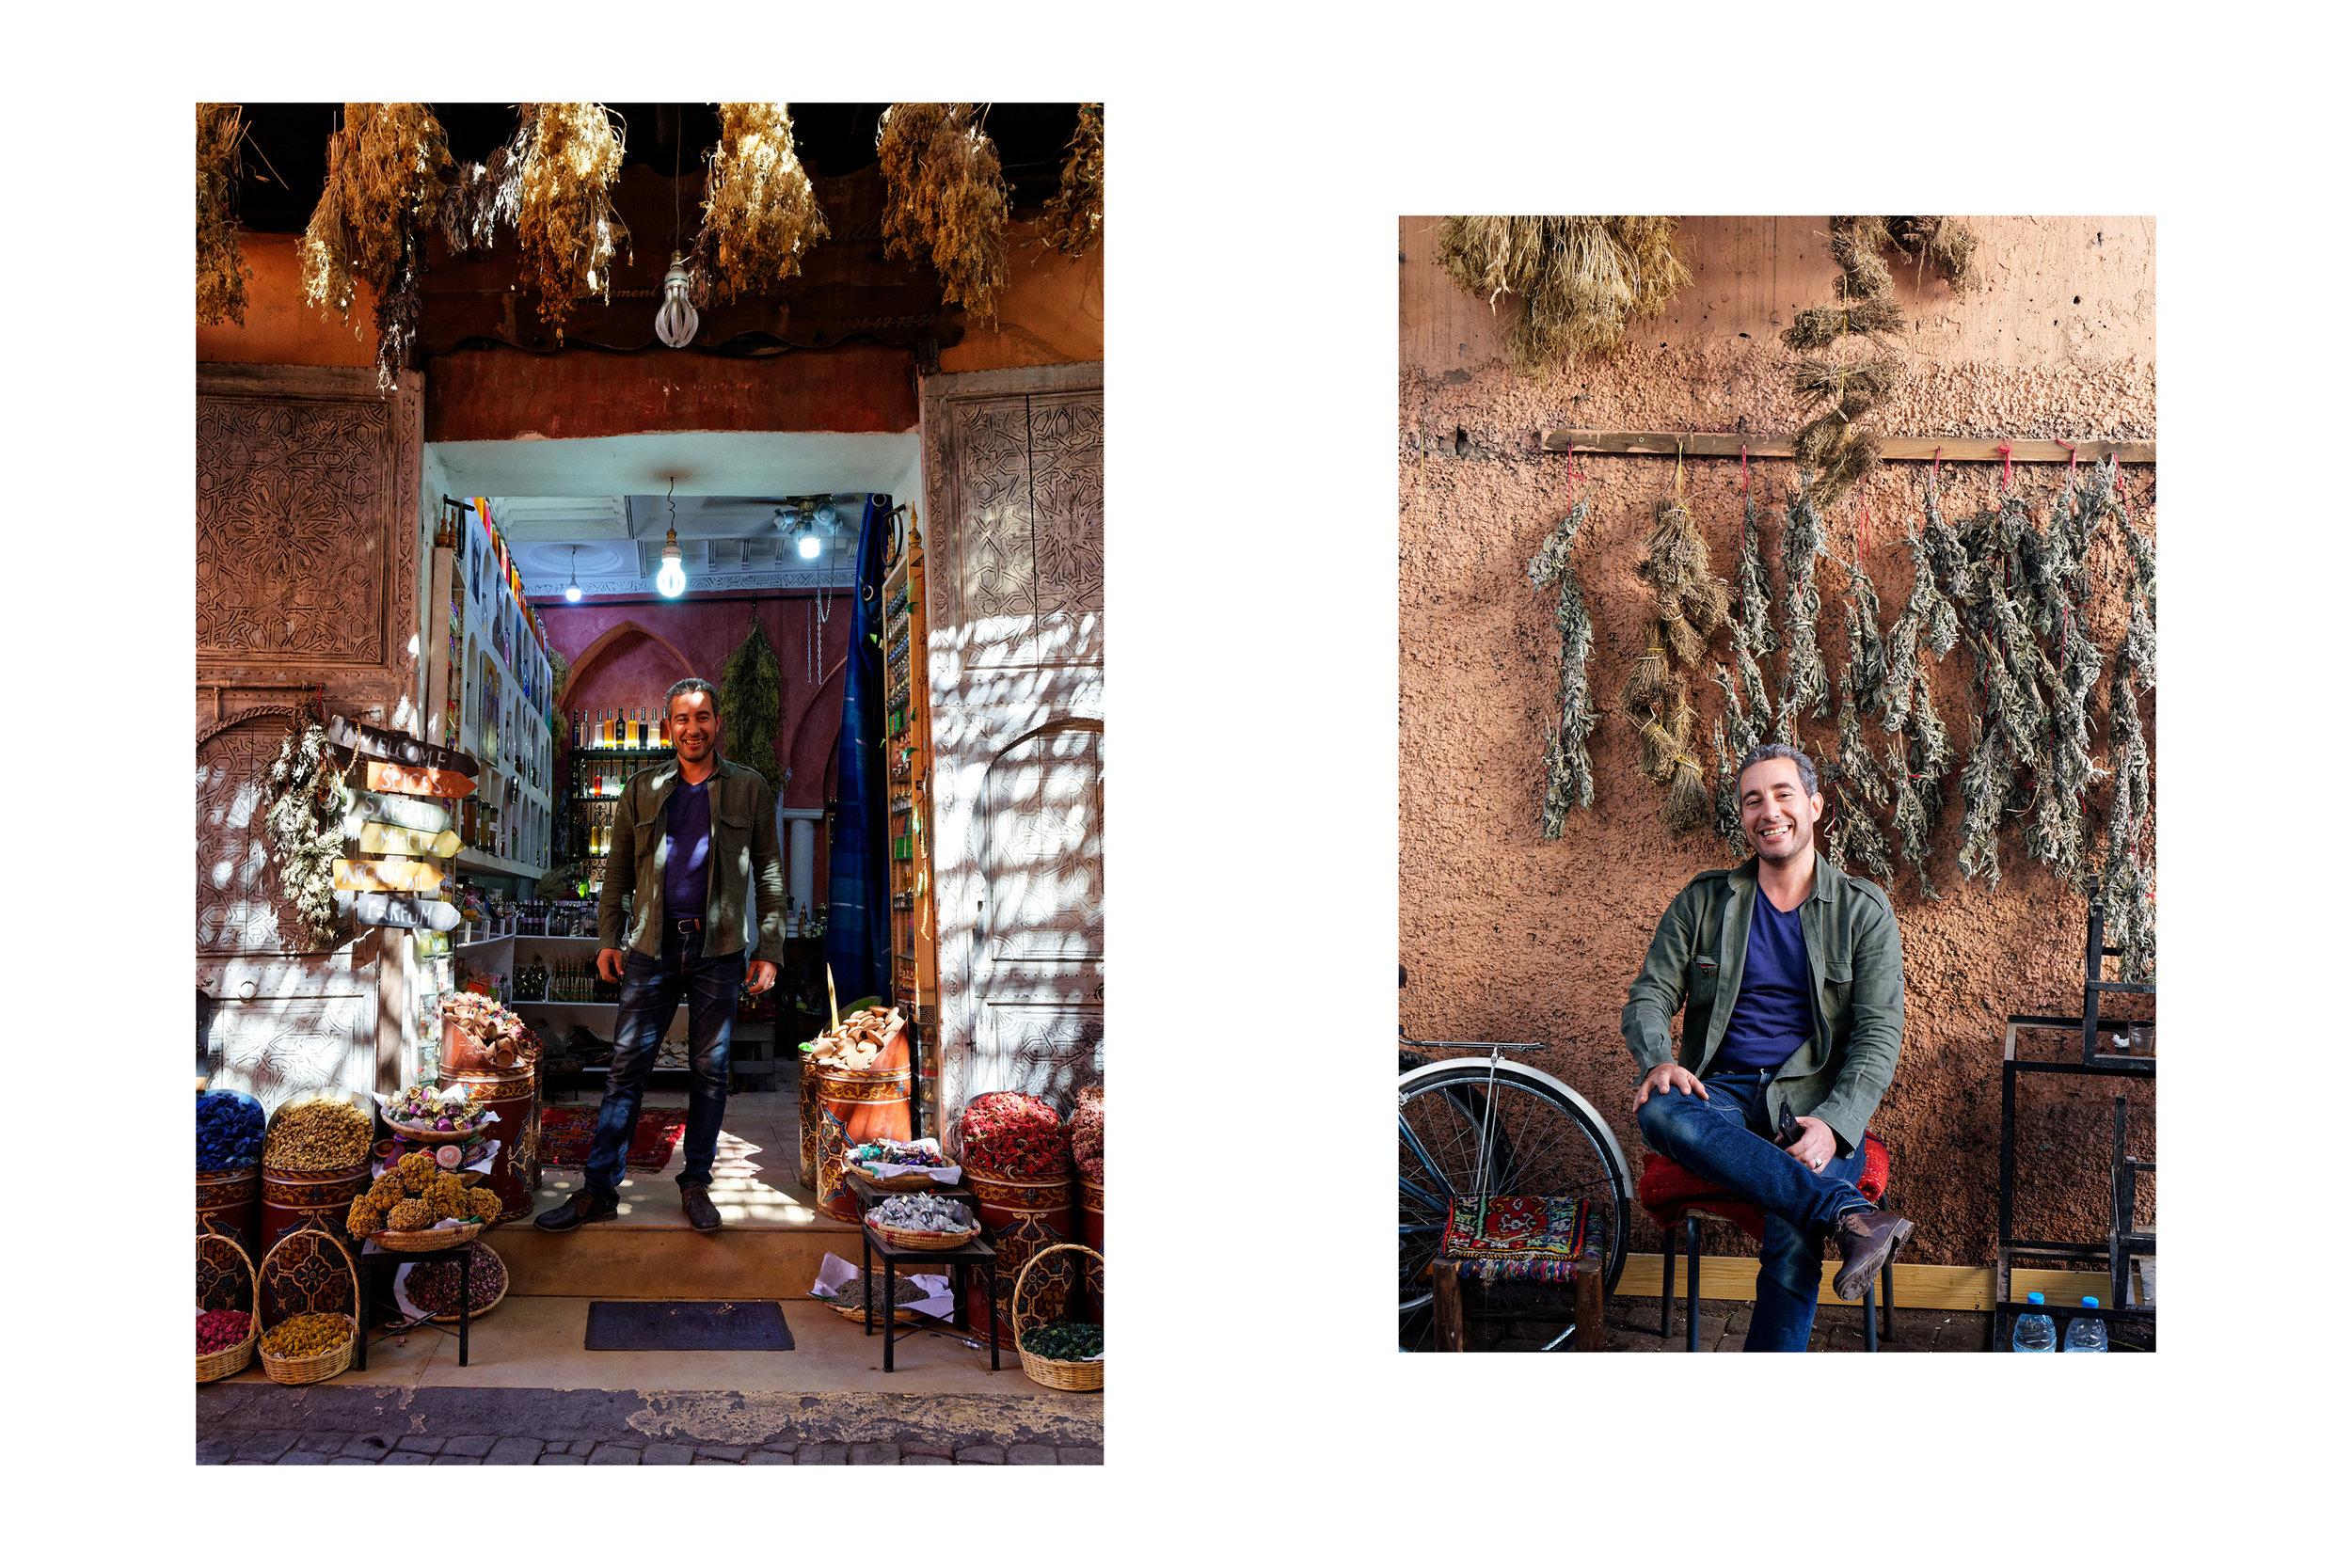 Ben Tajani à l'herboristerie, Marrakech